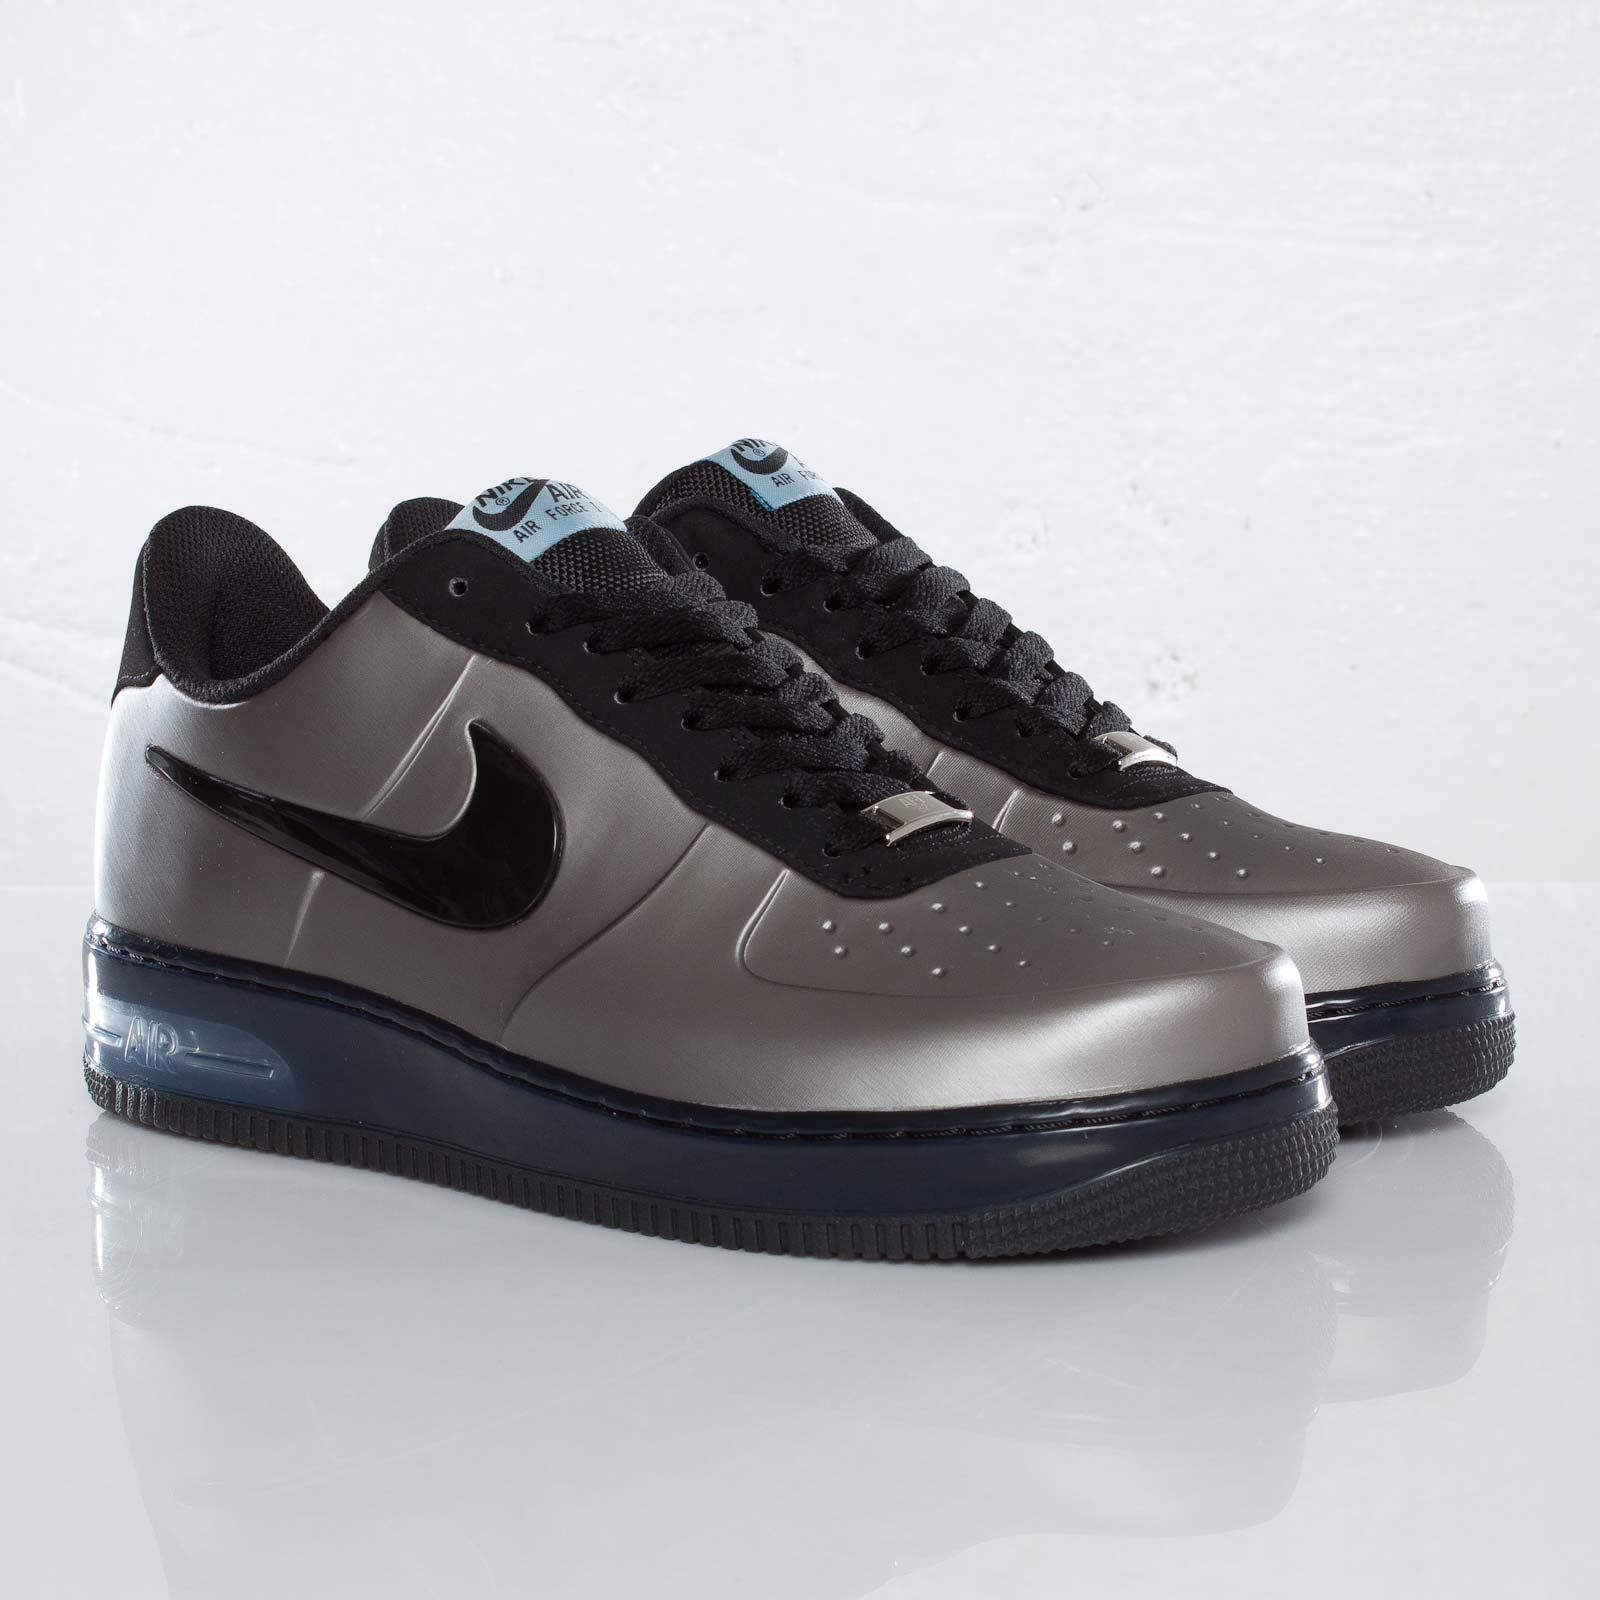 buy online 1e2e0 bb3dc Nike Air Force 1 Foamposite Pro Low